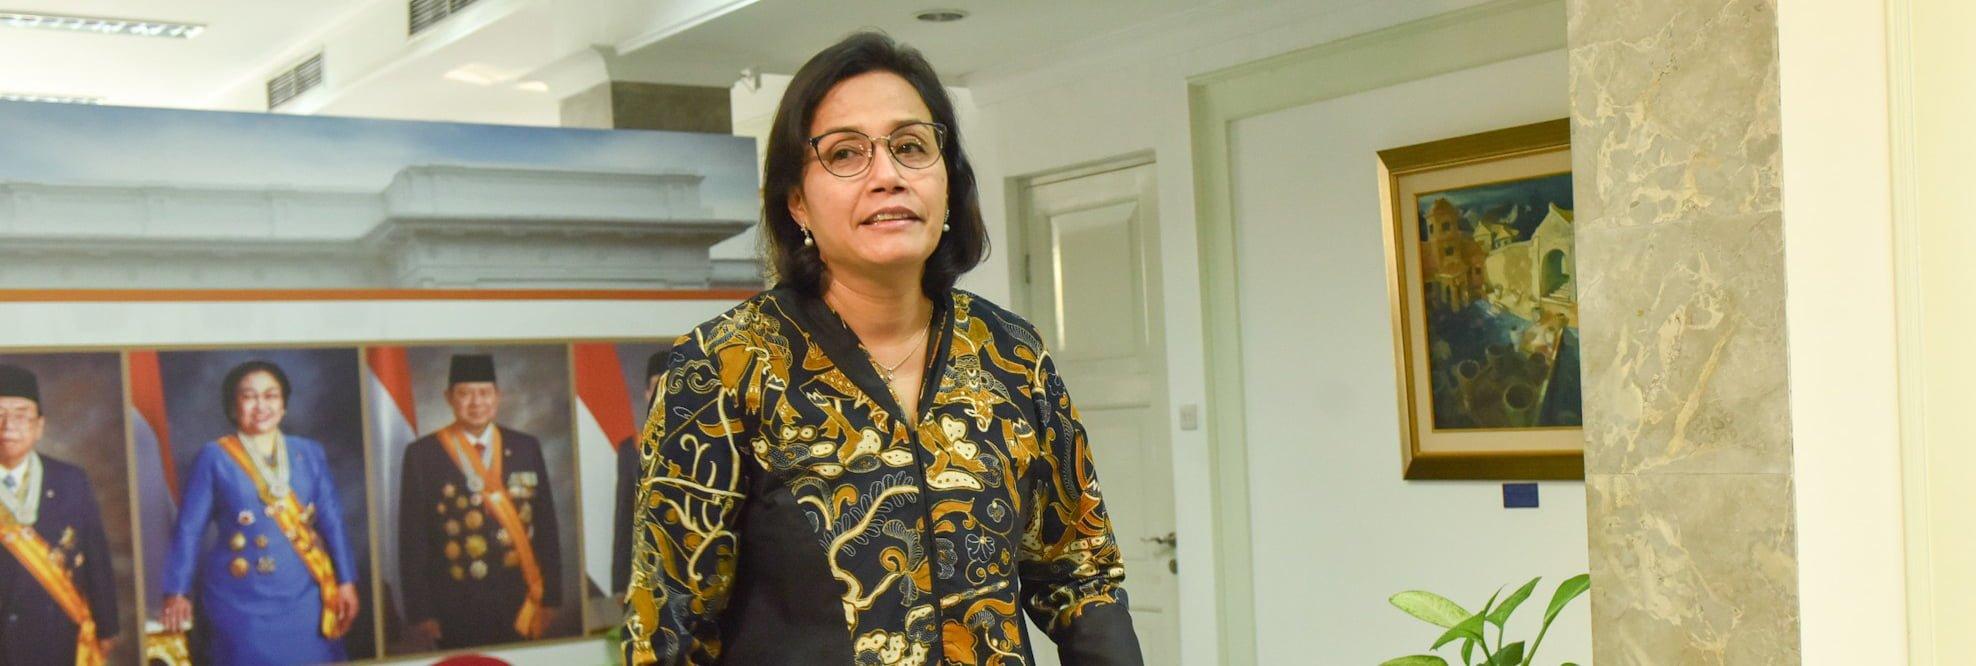 Ekspresi Sri Mulyani Indrawati, Menteri Keuangan